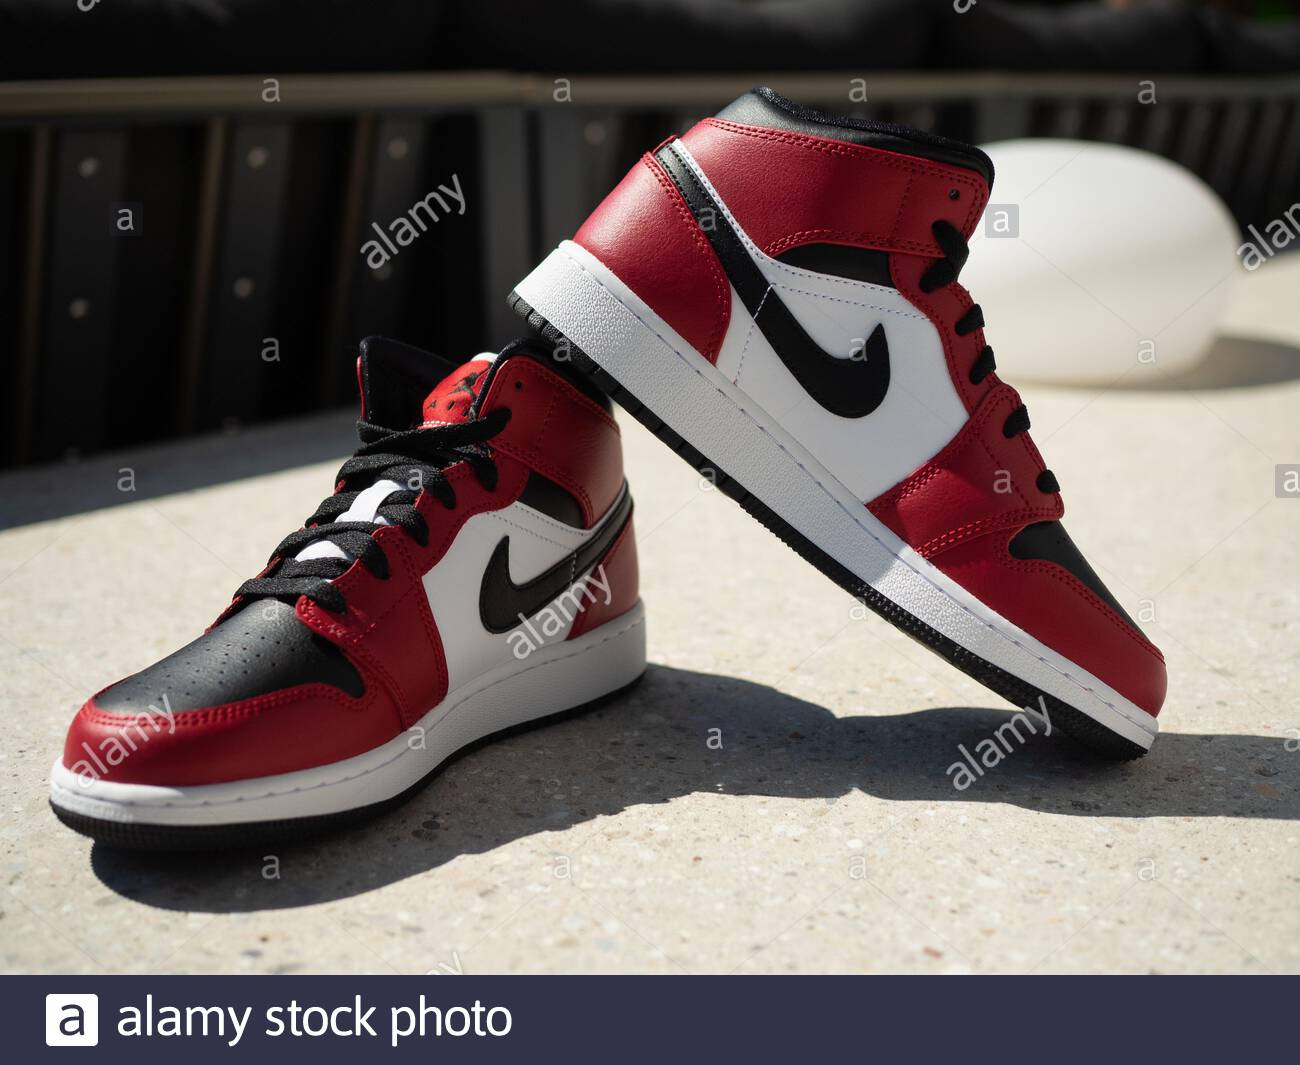 air jordan 1 retro roja y negra